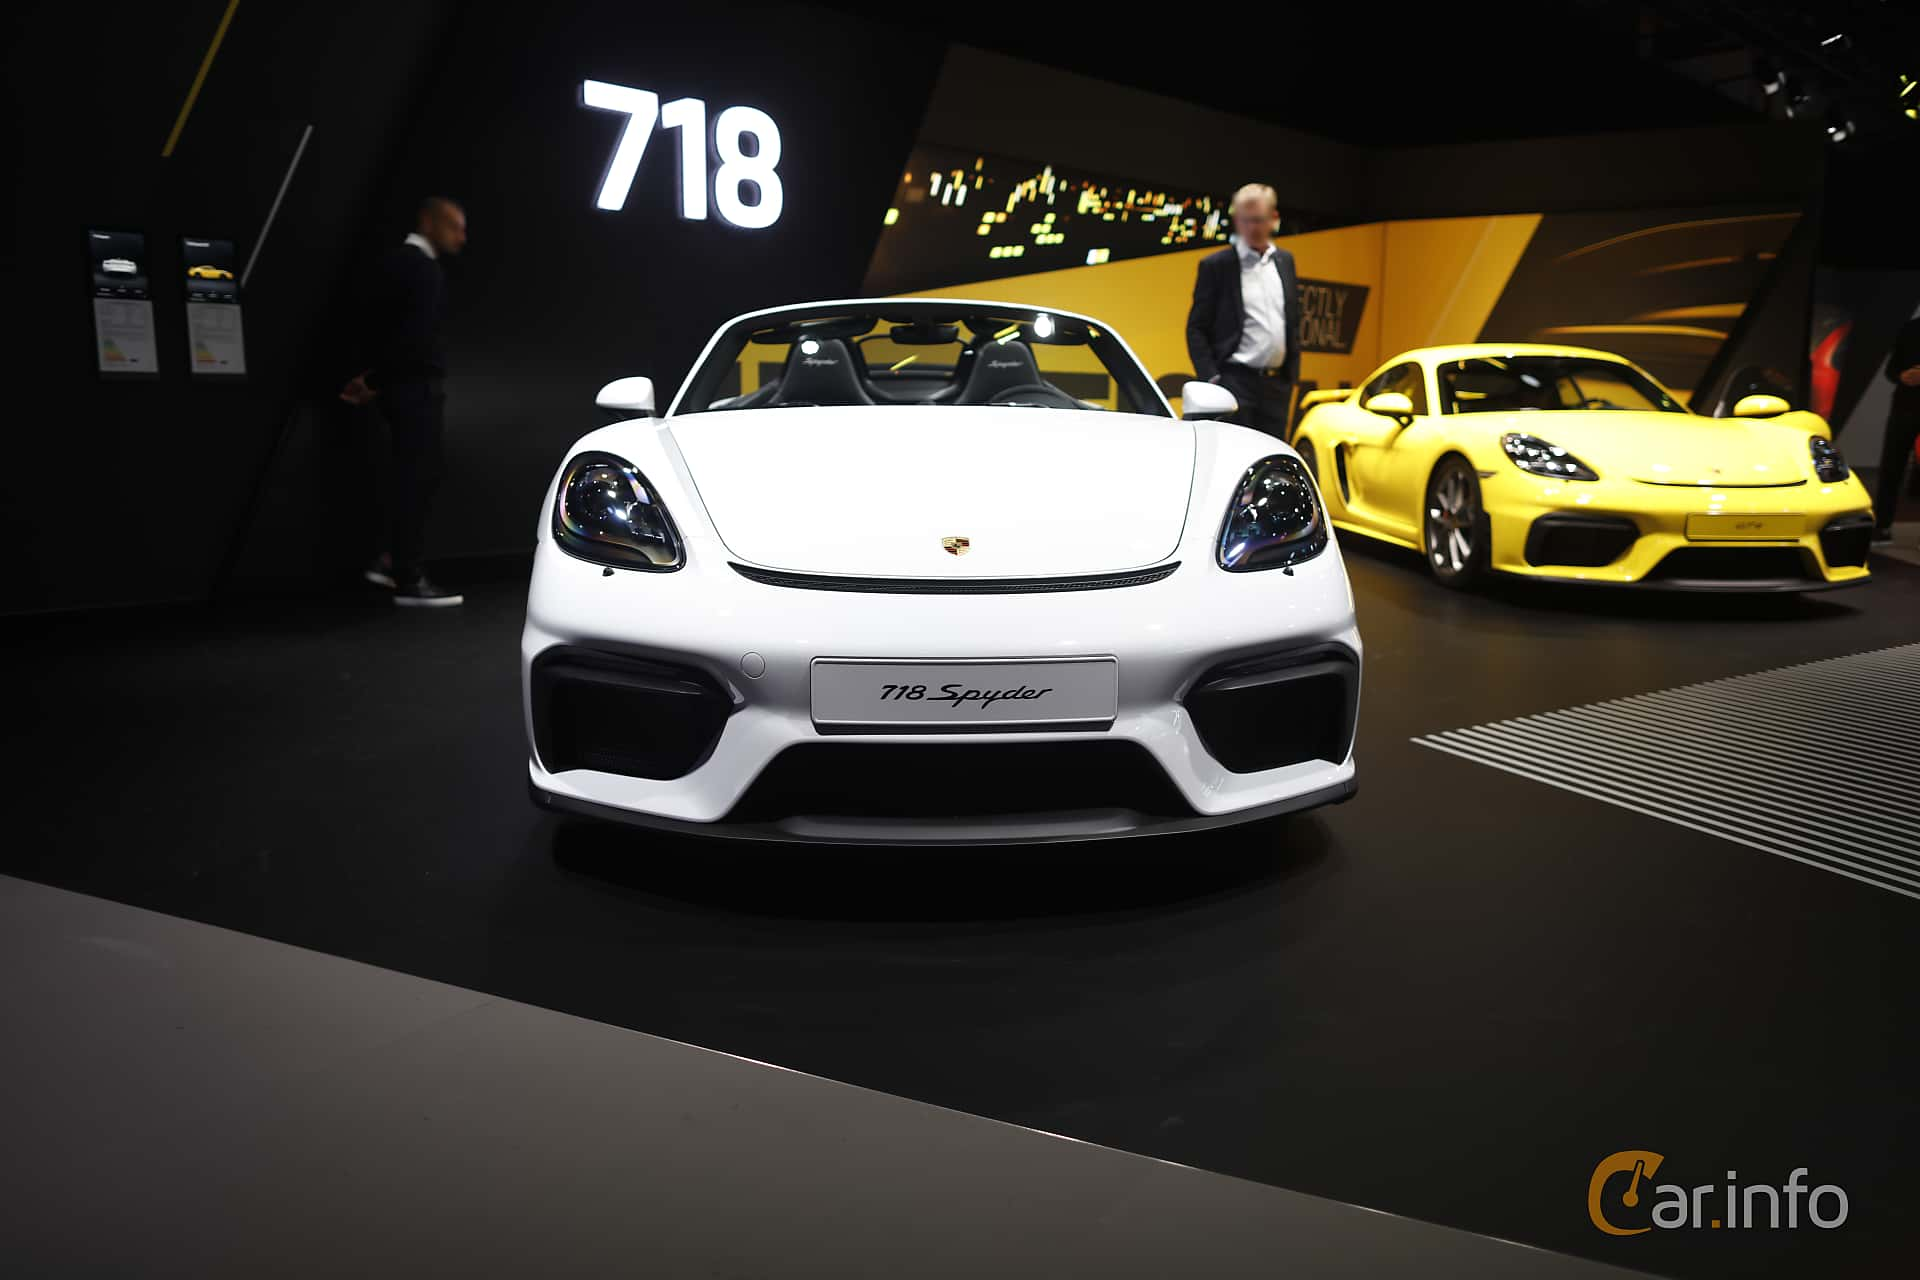 Porsche 718 Spyder 4.0 H6 Manual, 420hp, 2020 at IAA 2019